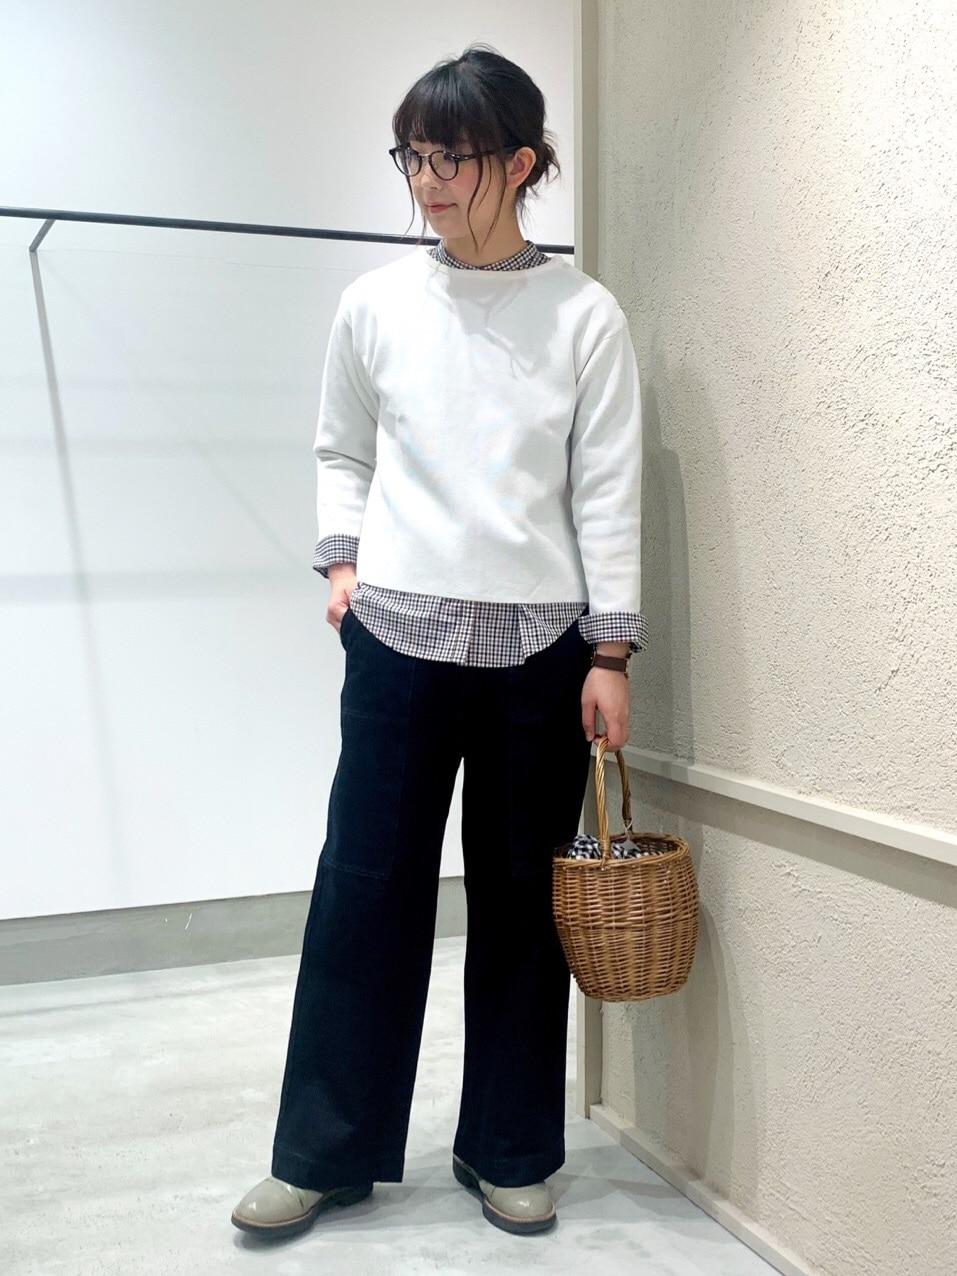 chambre de charme 横浜ジョイナス 身長:162cm 2021.02.06